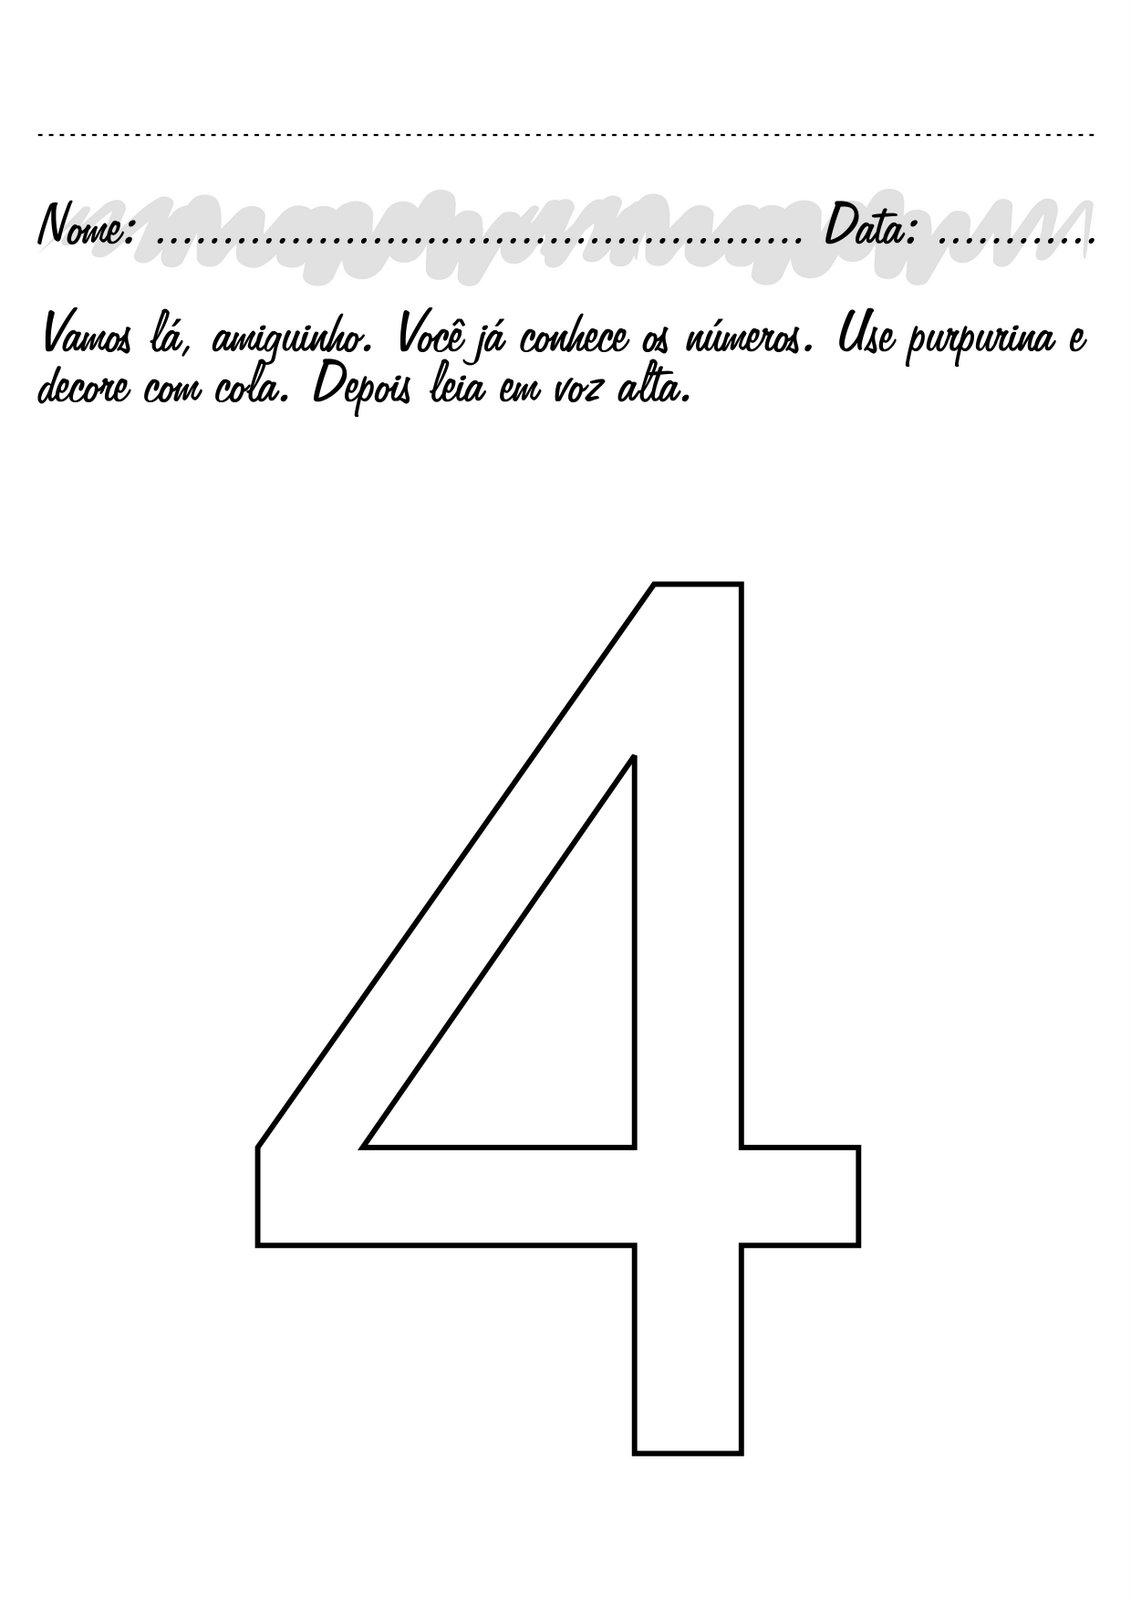 Ver más ideas sobre números preescolar, numero para colorear, actividades de matemáticas preescolares. ATIVIDADES COM NUMERO 4 PARA EDUCAÇÃO INFANTIL